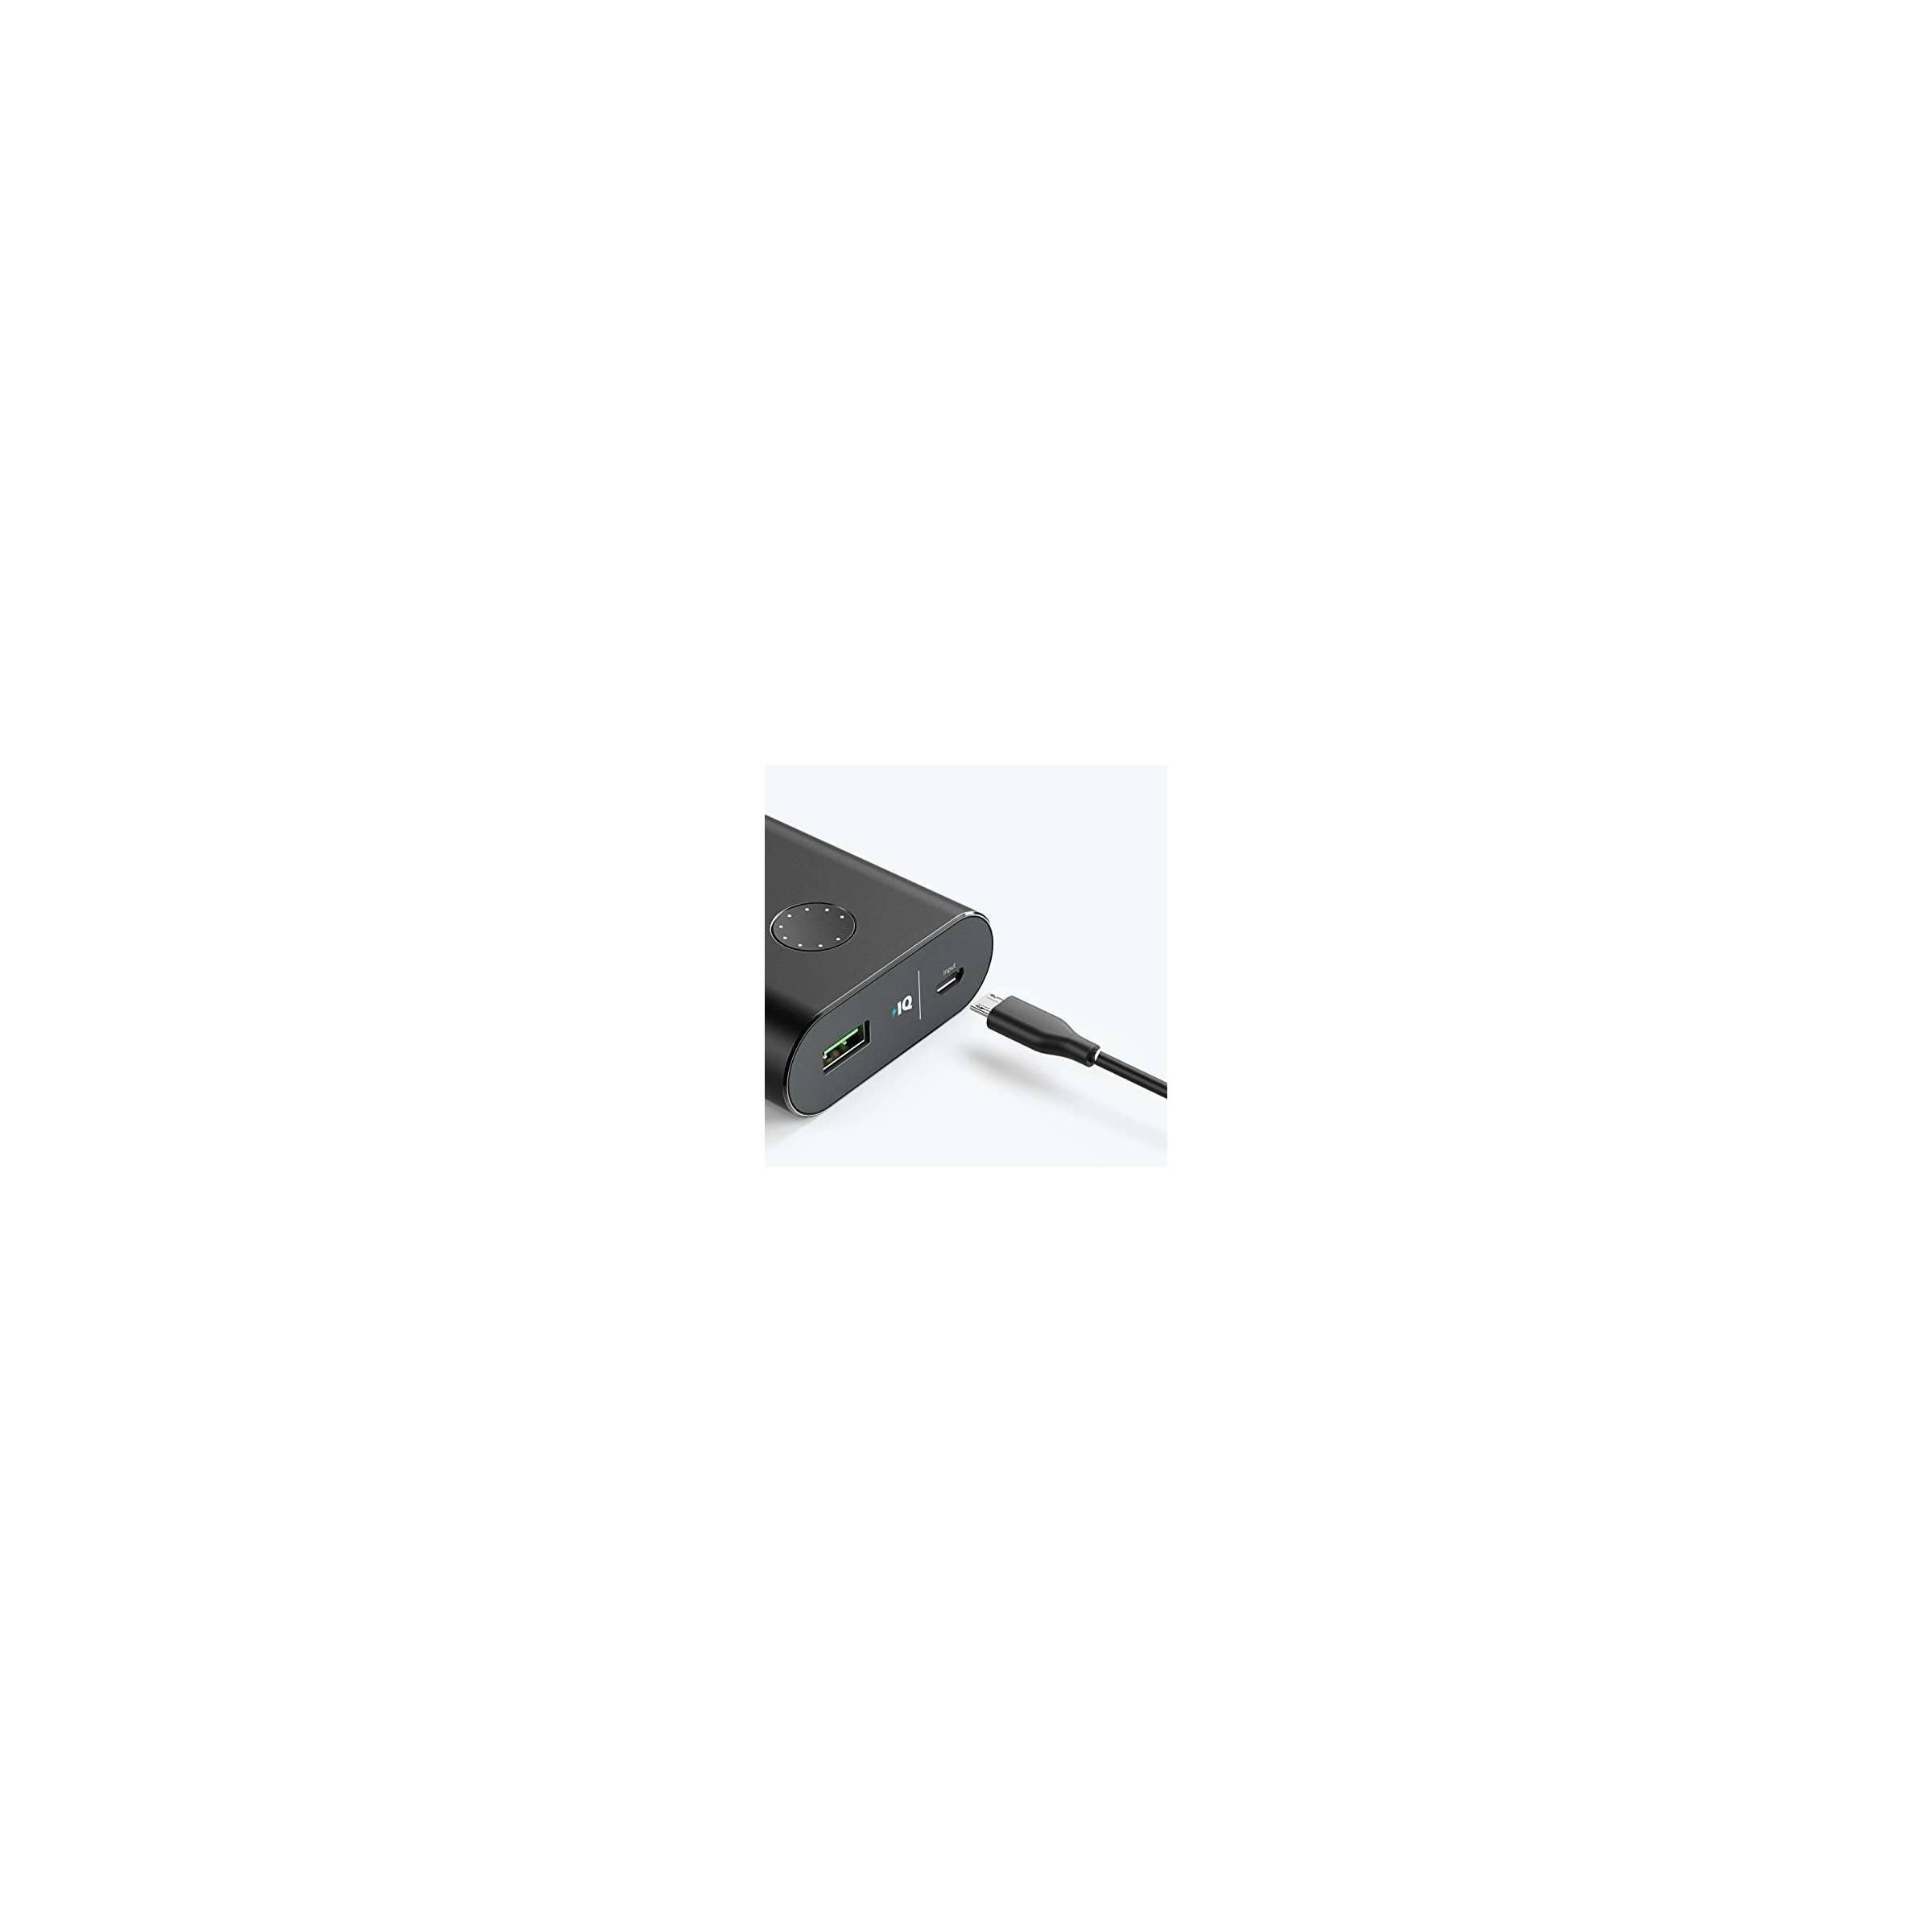 anker – Anker powercore+ 10 050mah powerbank quick charge 3.0 sort/sølv farve sort på mackabler.dk